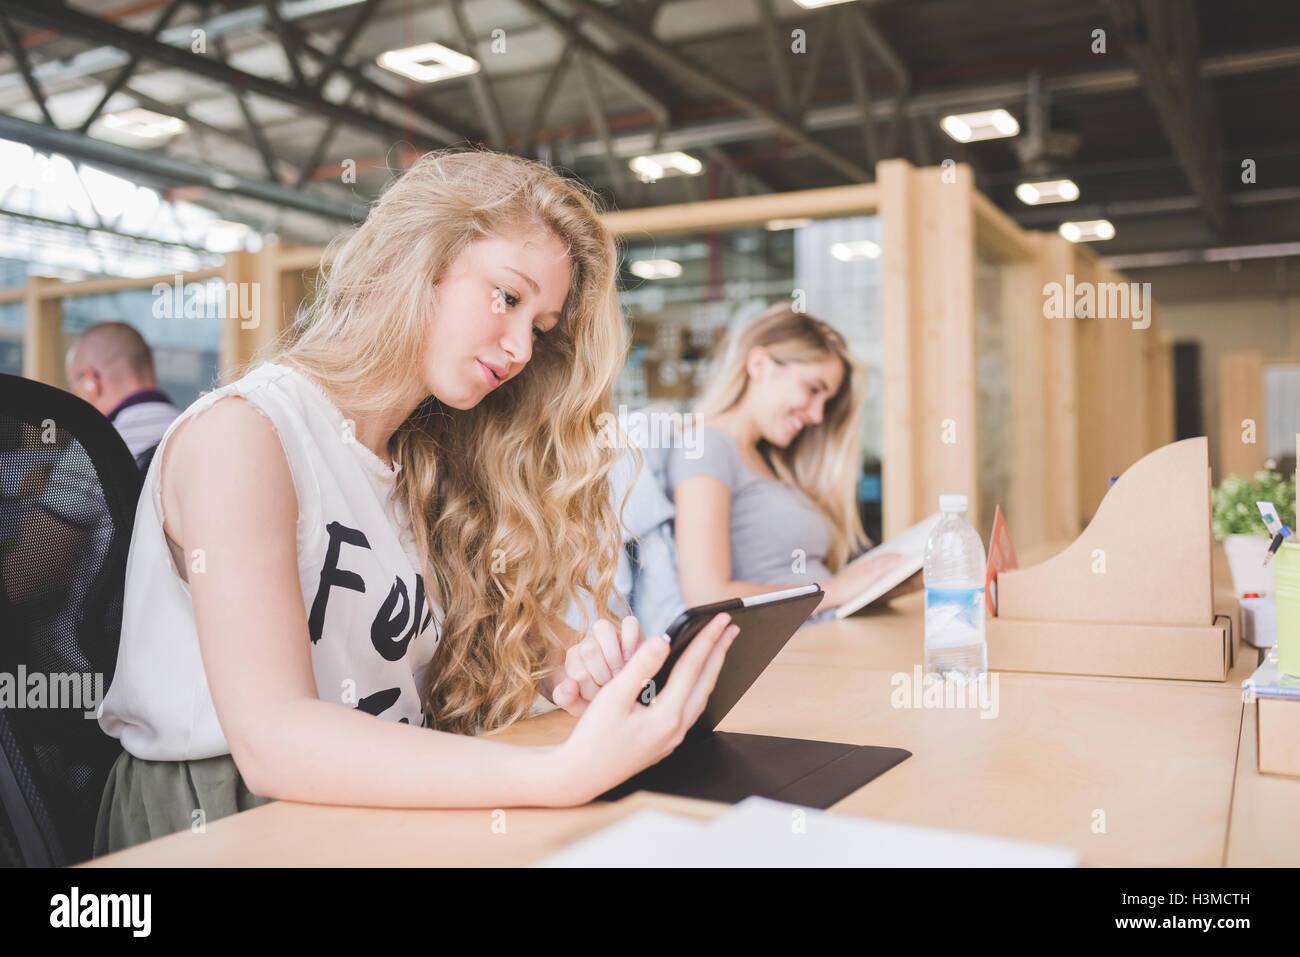 Mitarbeiter arbeiten an digital-Tablette im Großraumbüro Stockbild